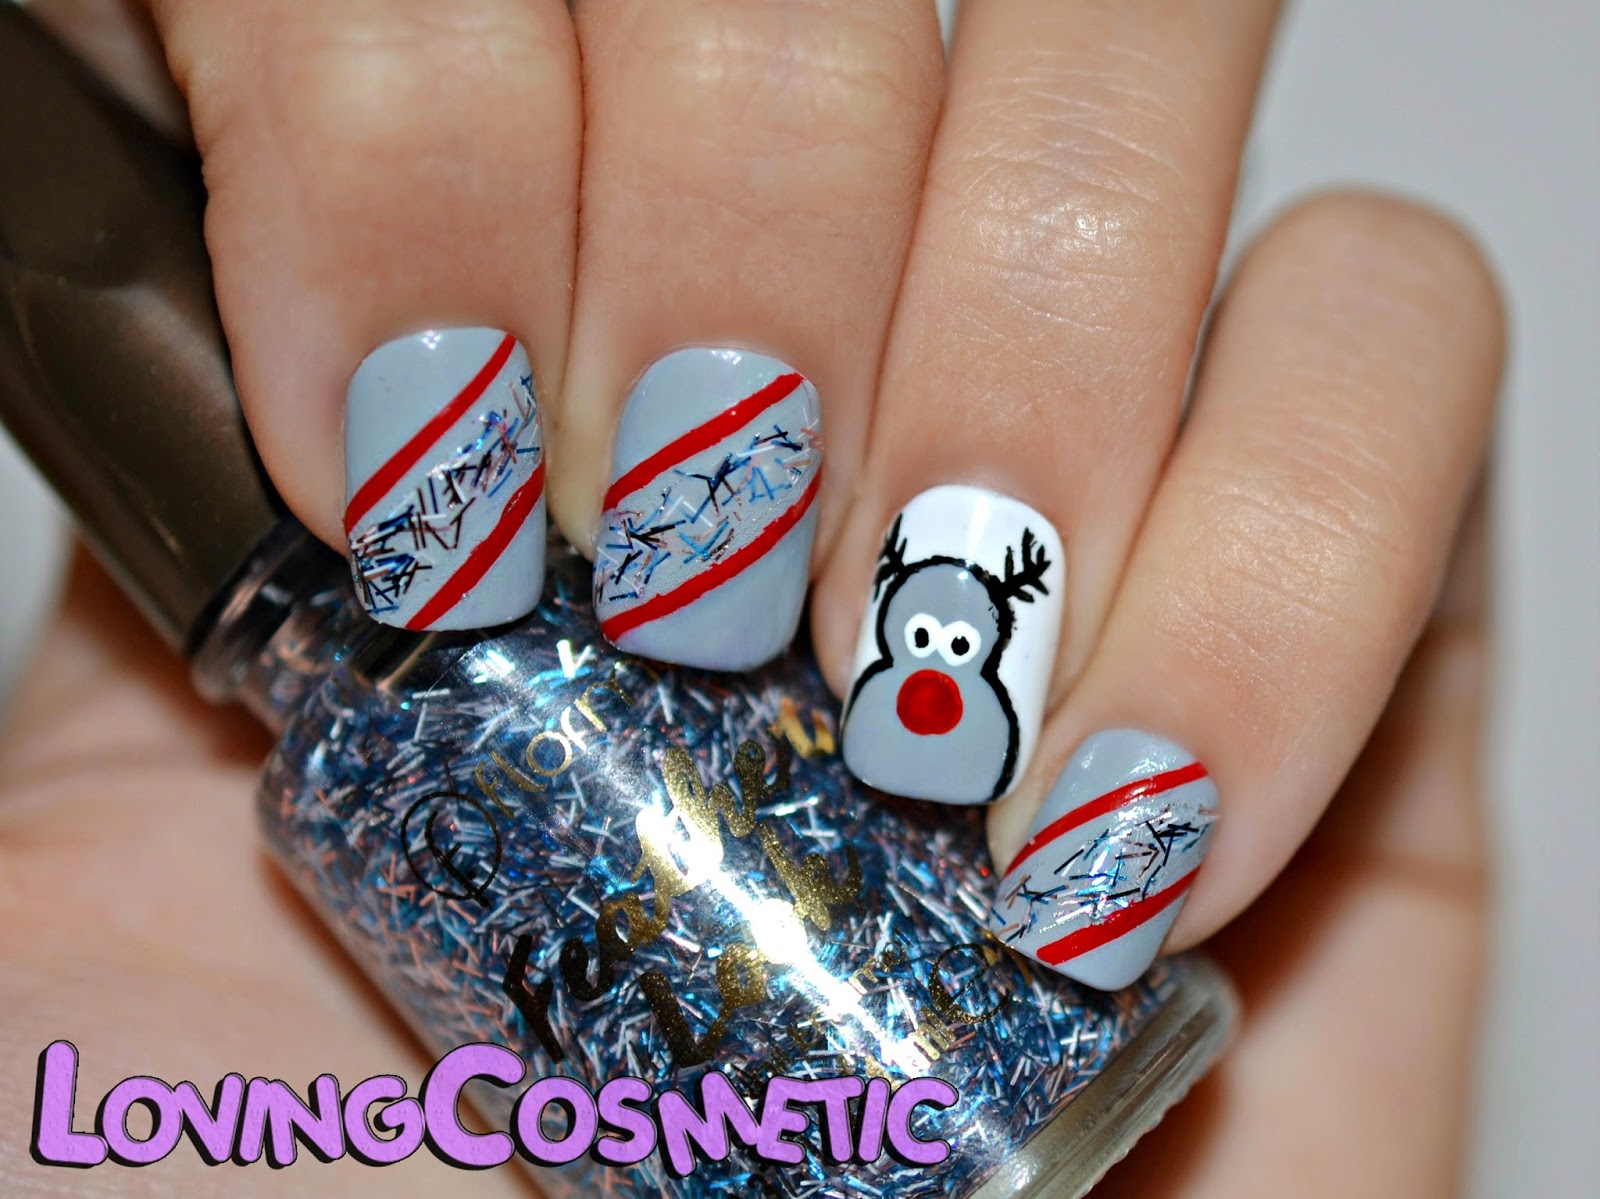 Uñas uña nail art nails nailart diseño flormar festher look